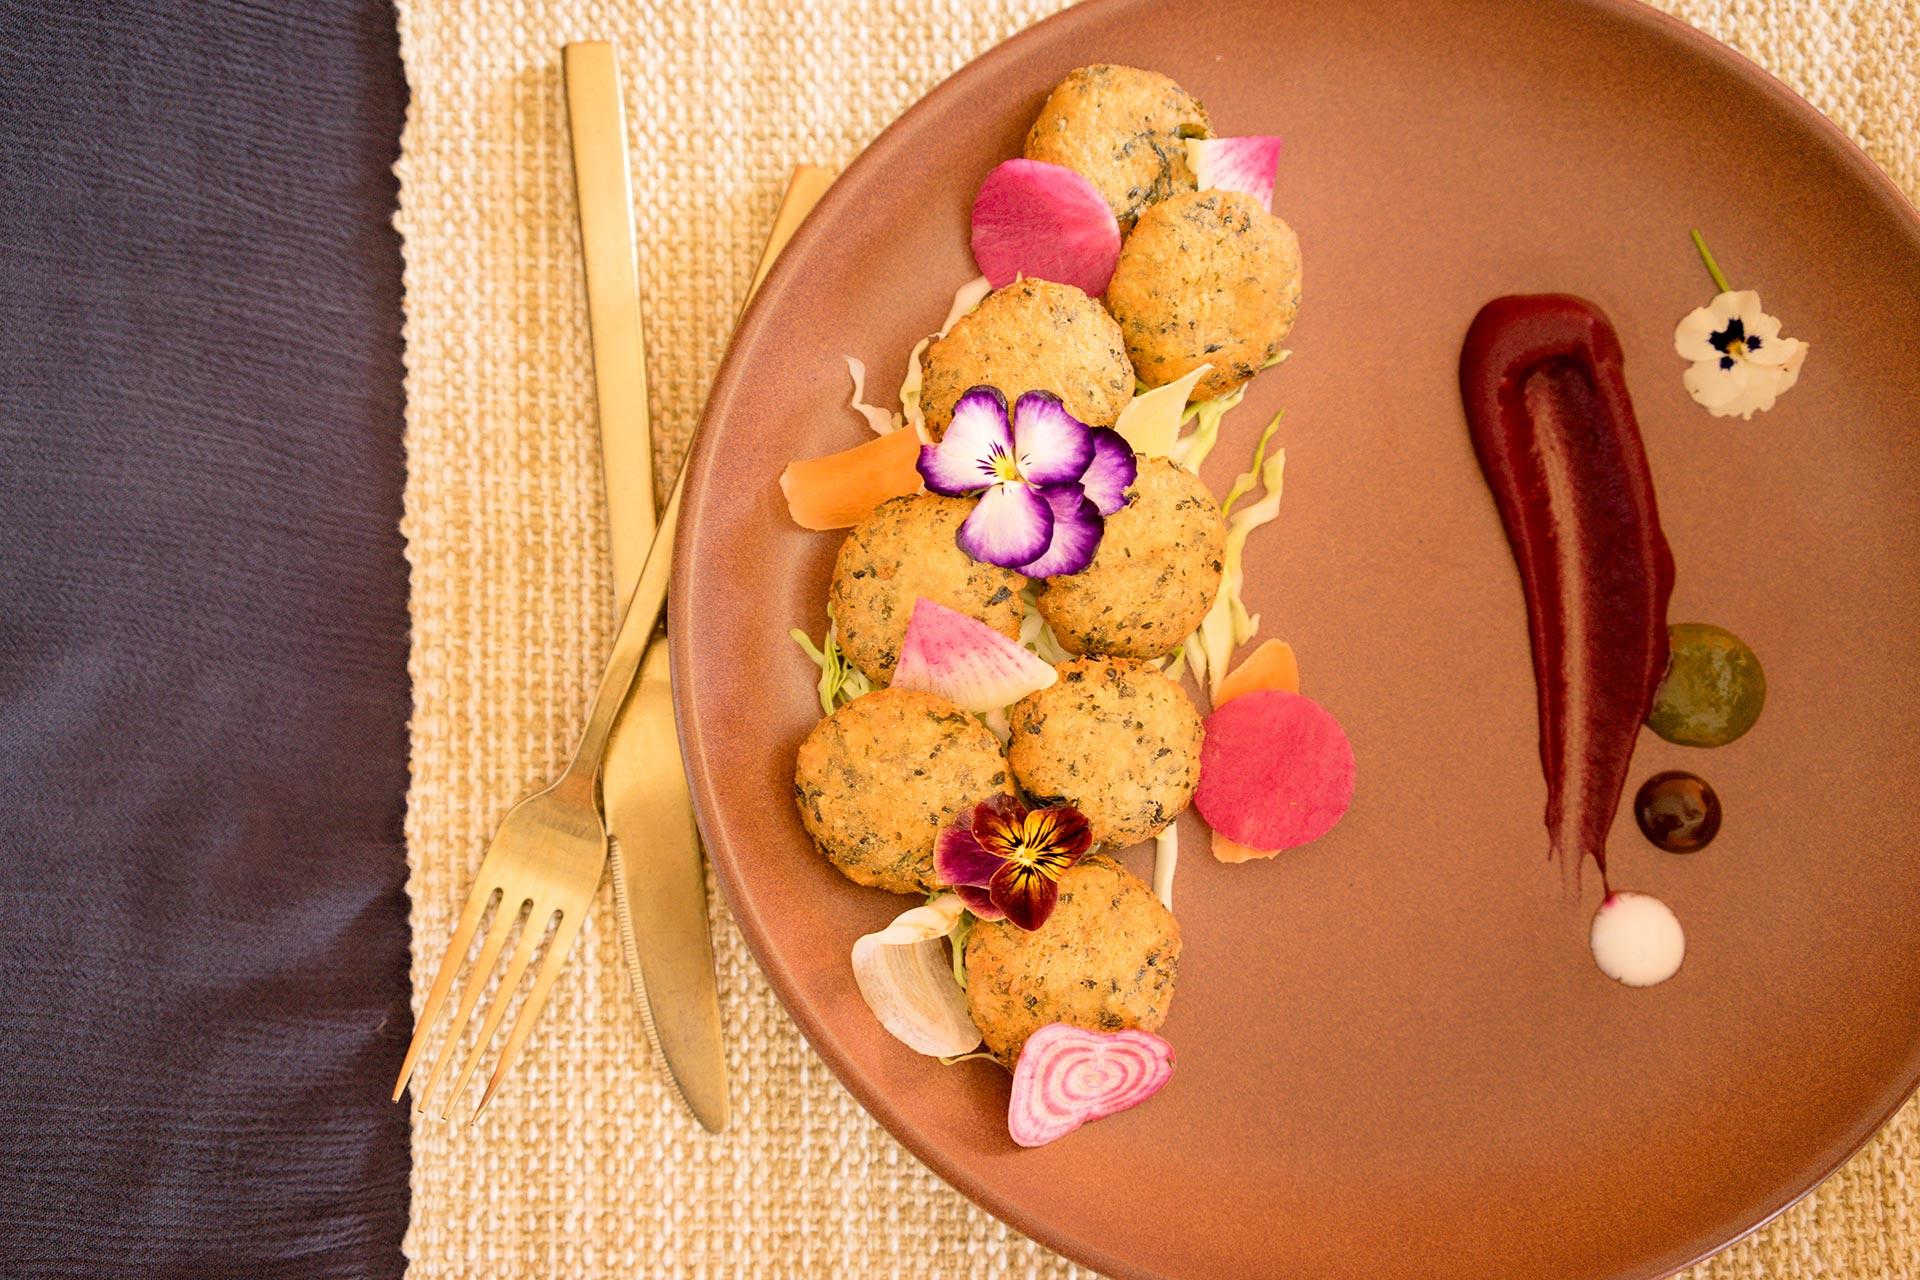 keeva-sf-restaurant-food-photographer-a-few-good-clicks-22.jpg